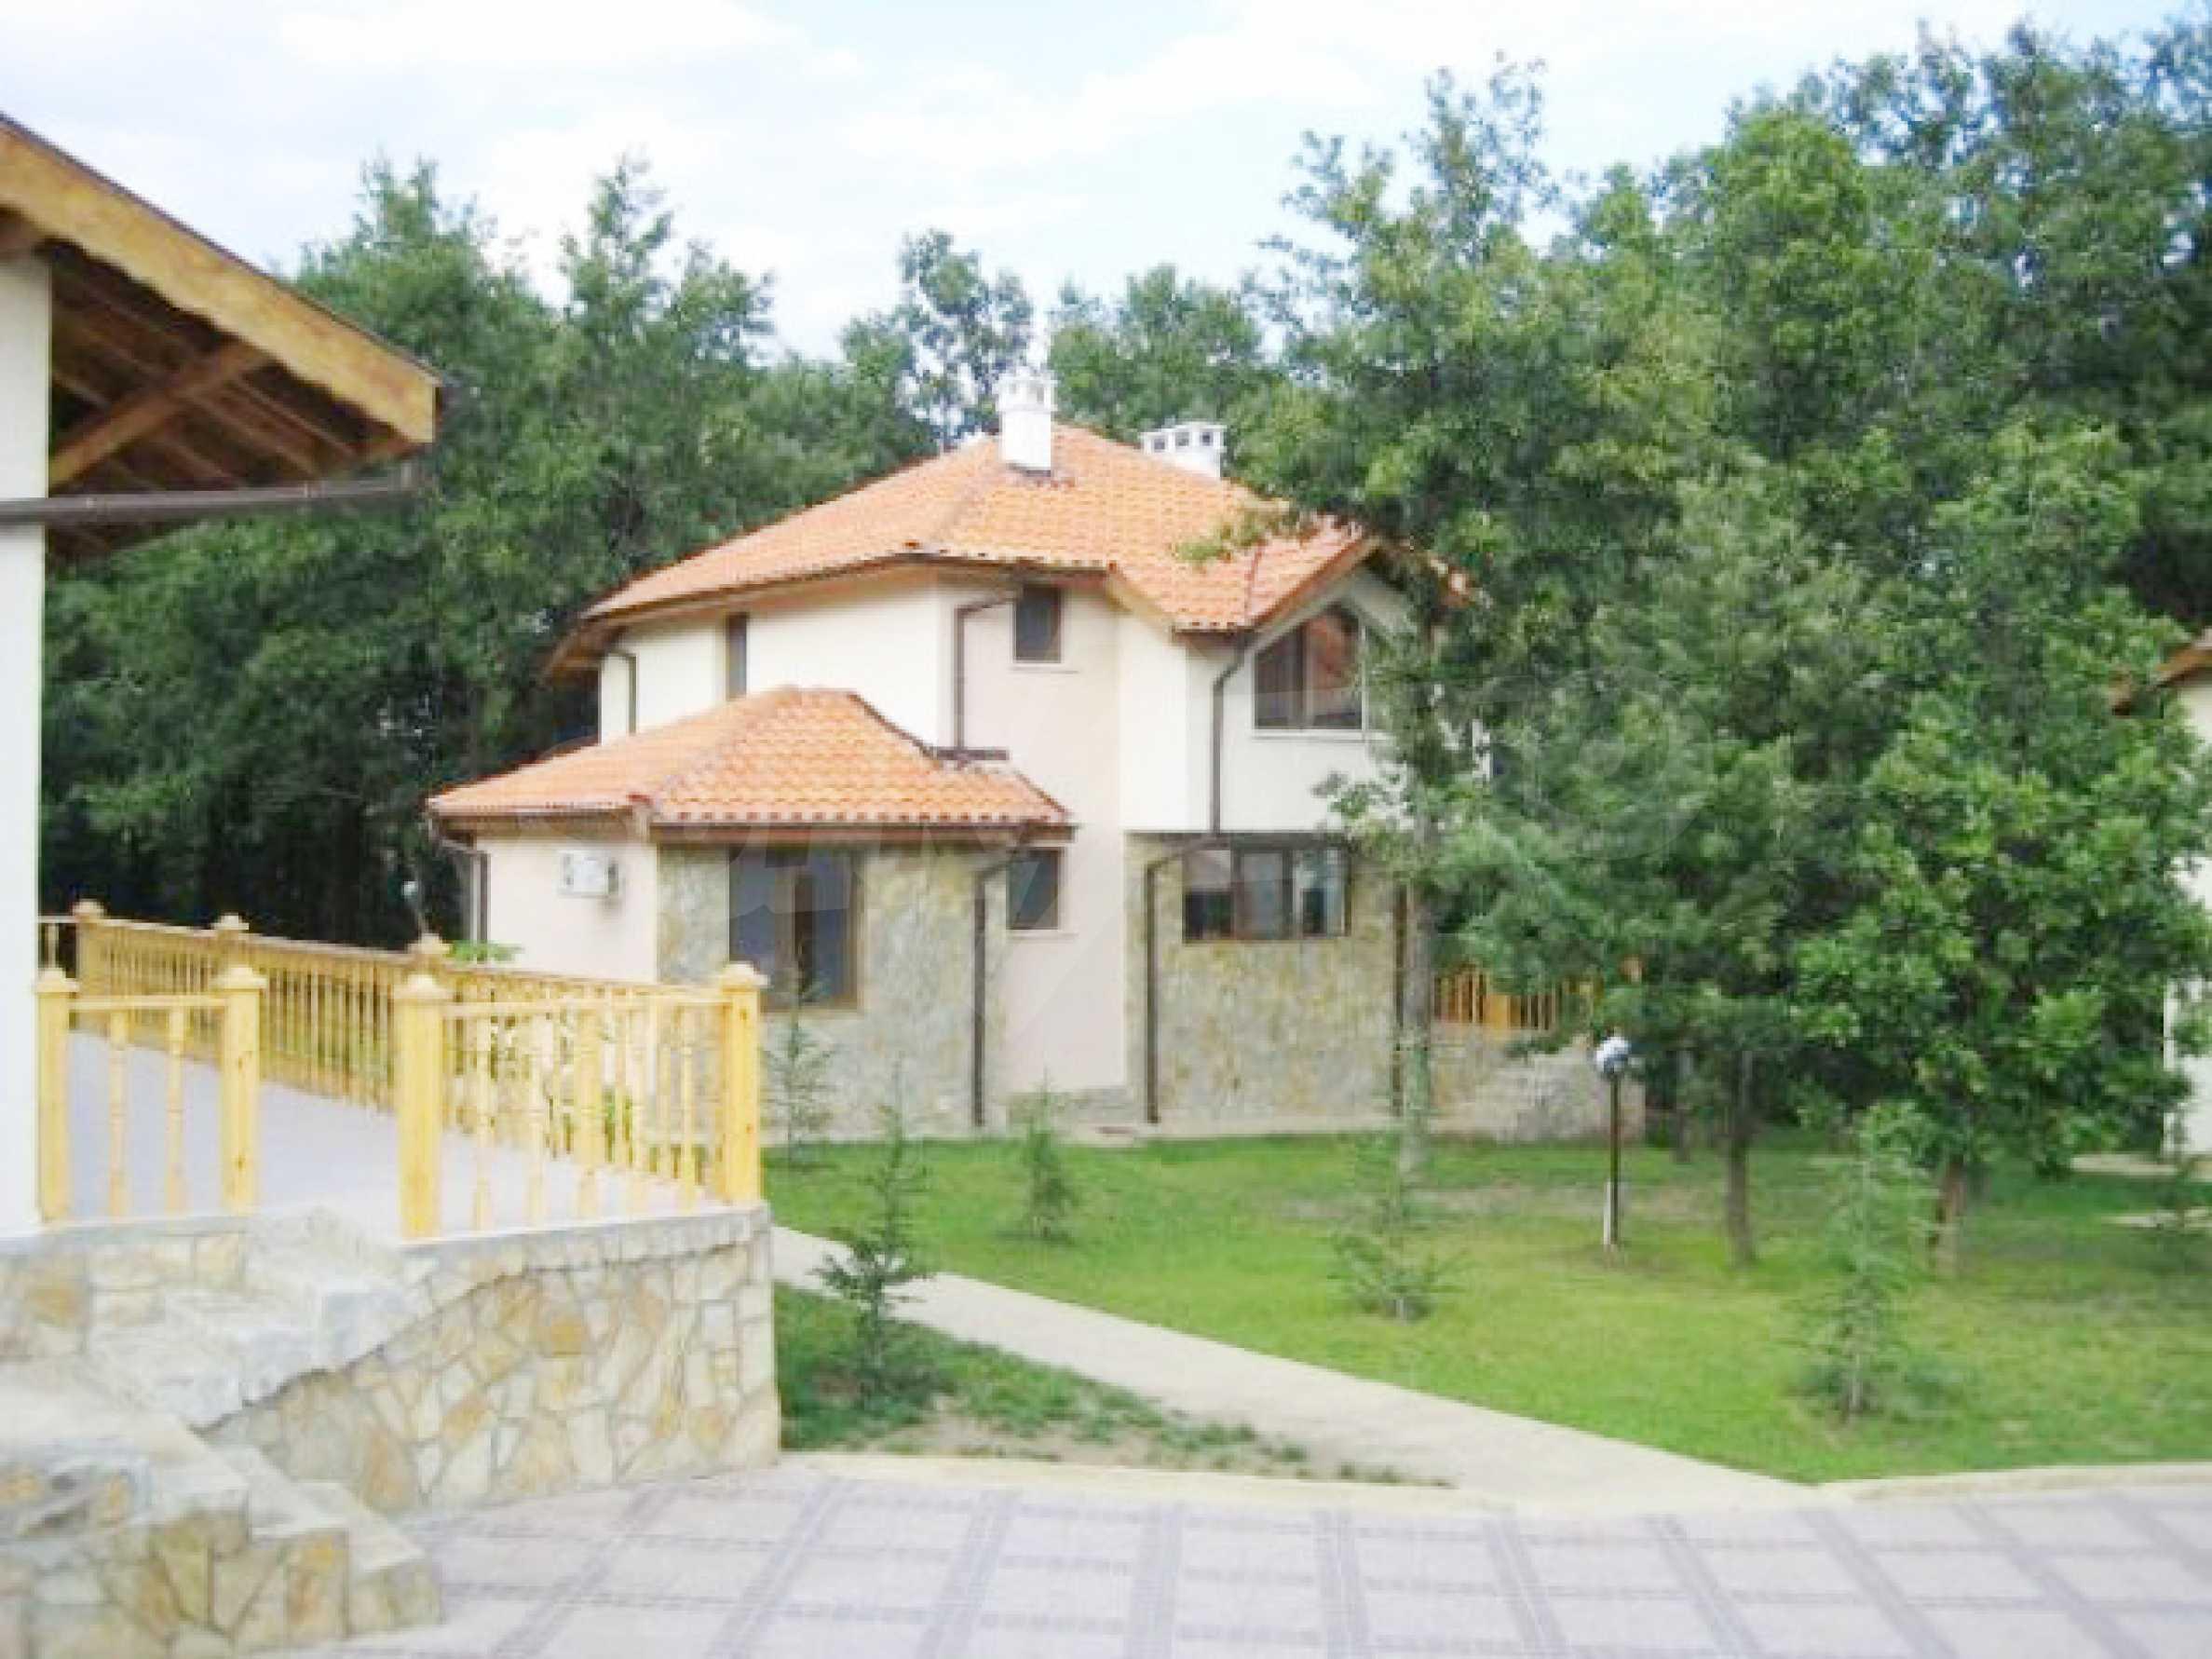 Дом близо до г. Варна